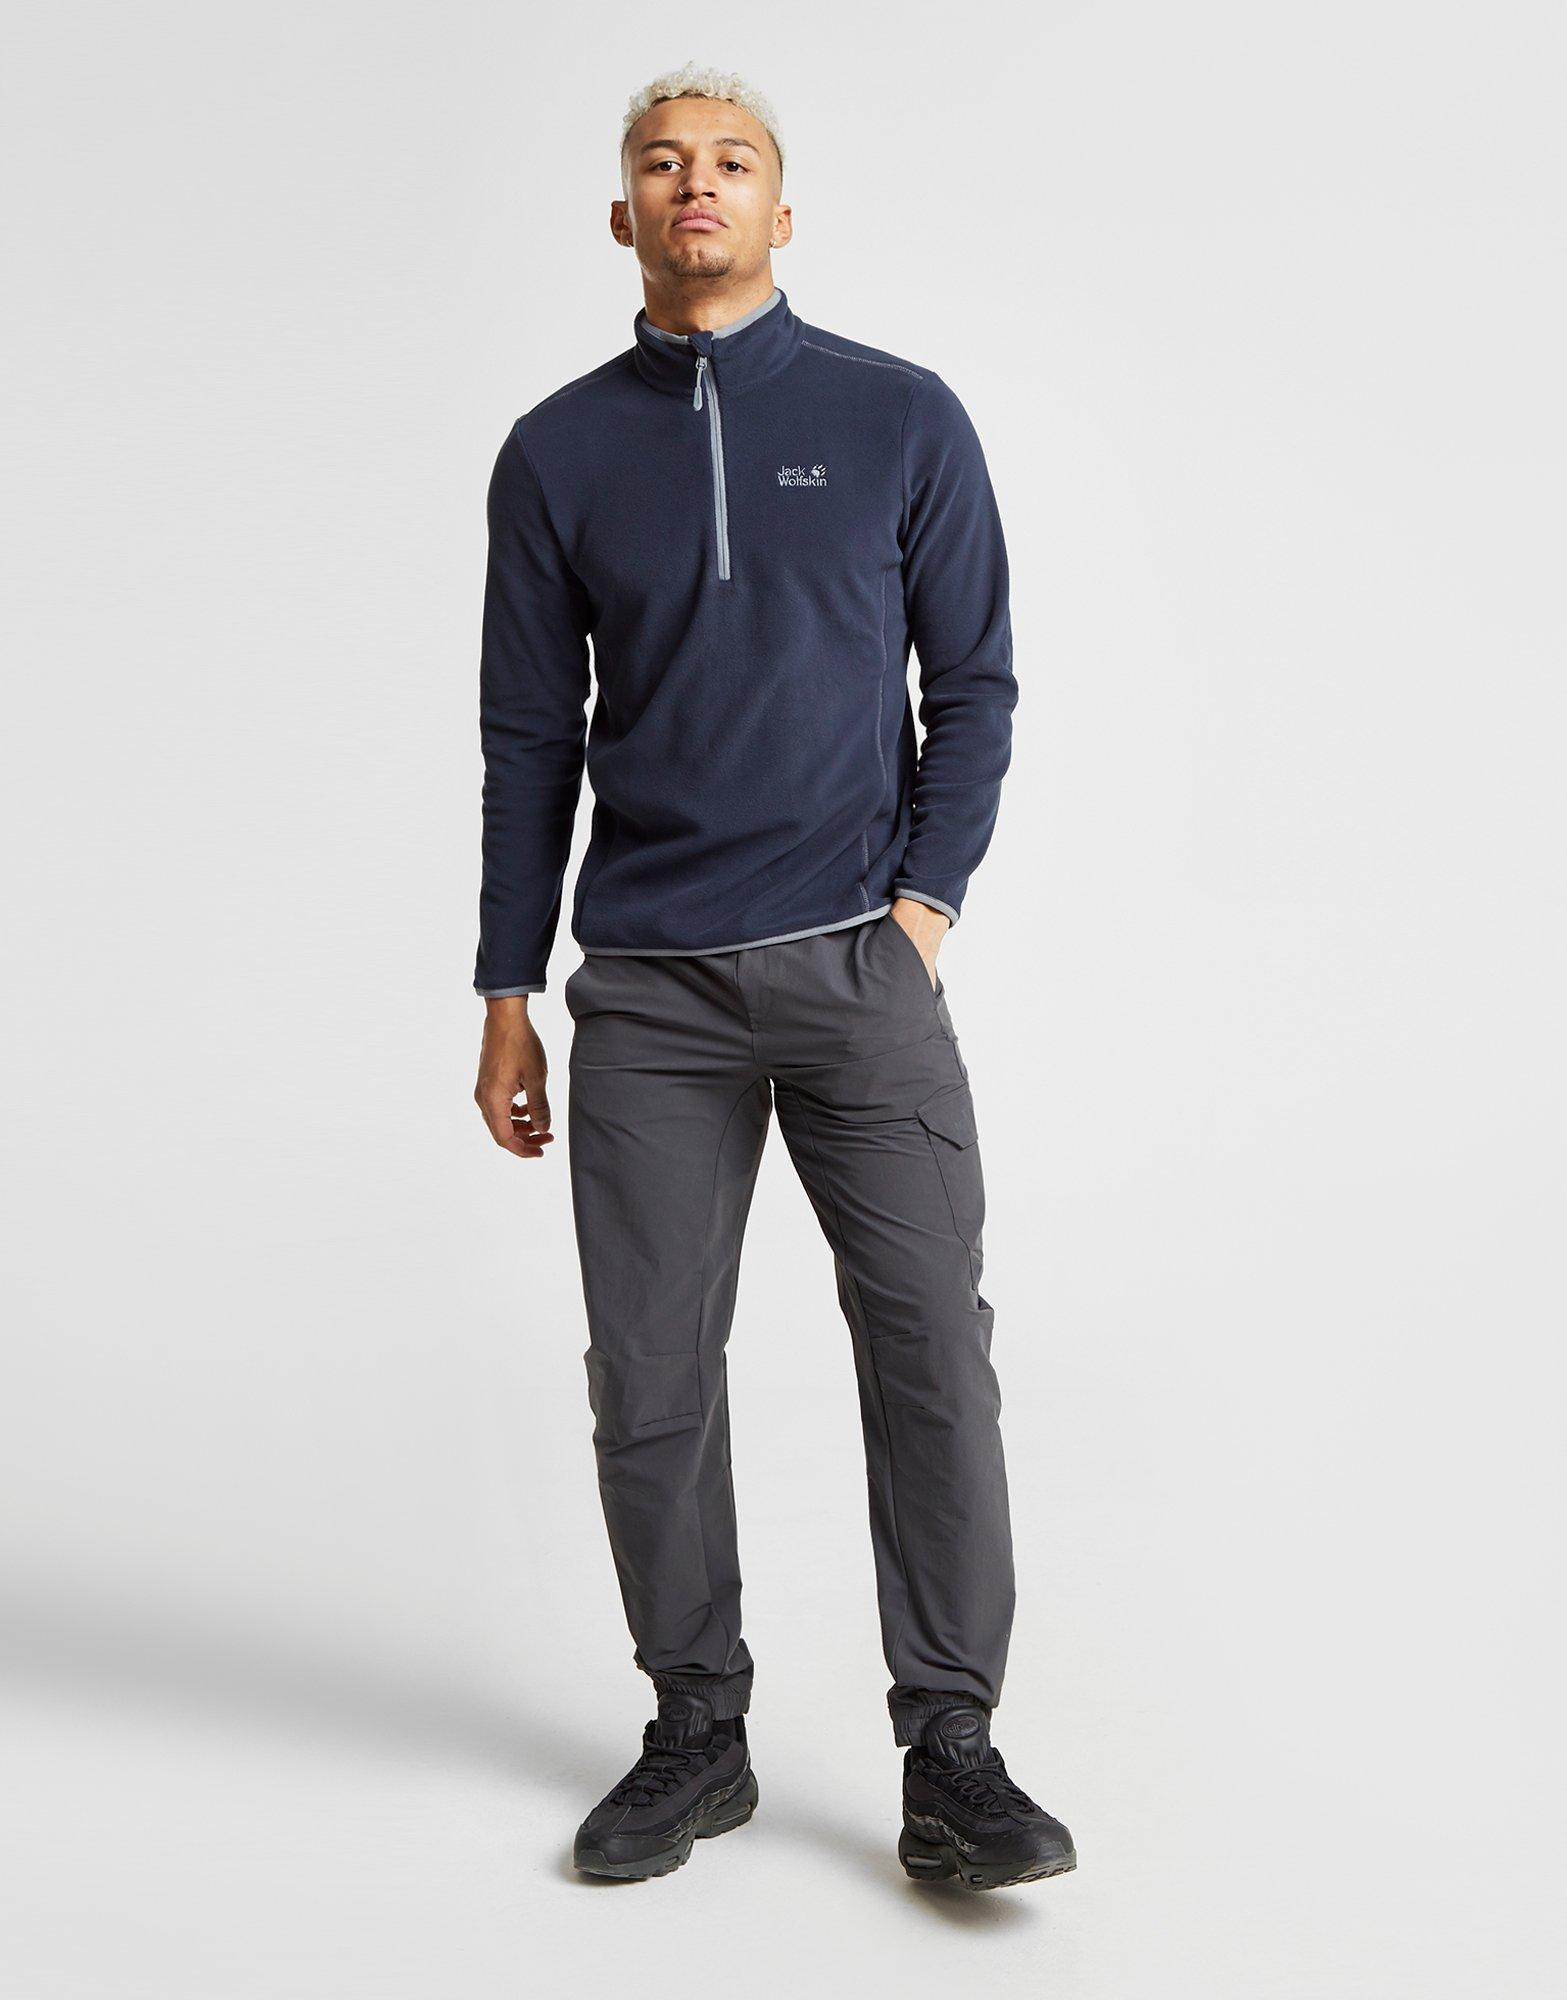 Lyst Jack Wolfskin Echo 1 4 Zip Sweatshirt In Blue For Men Jake Fleece Combie Grey View Fullscreen